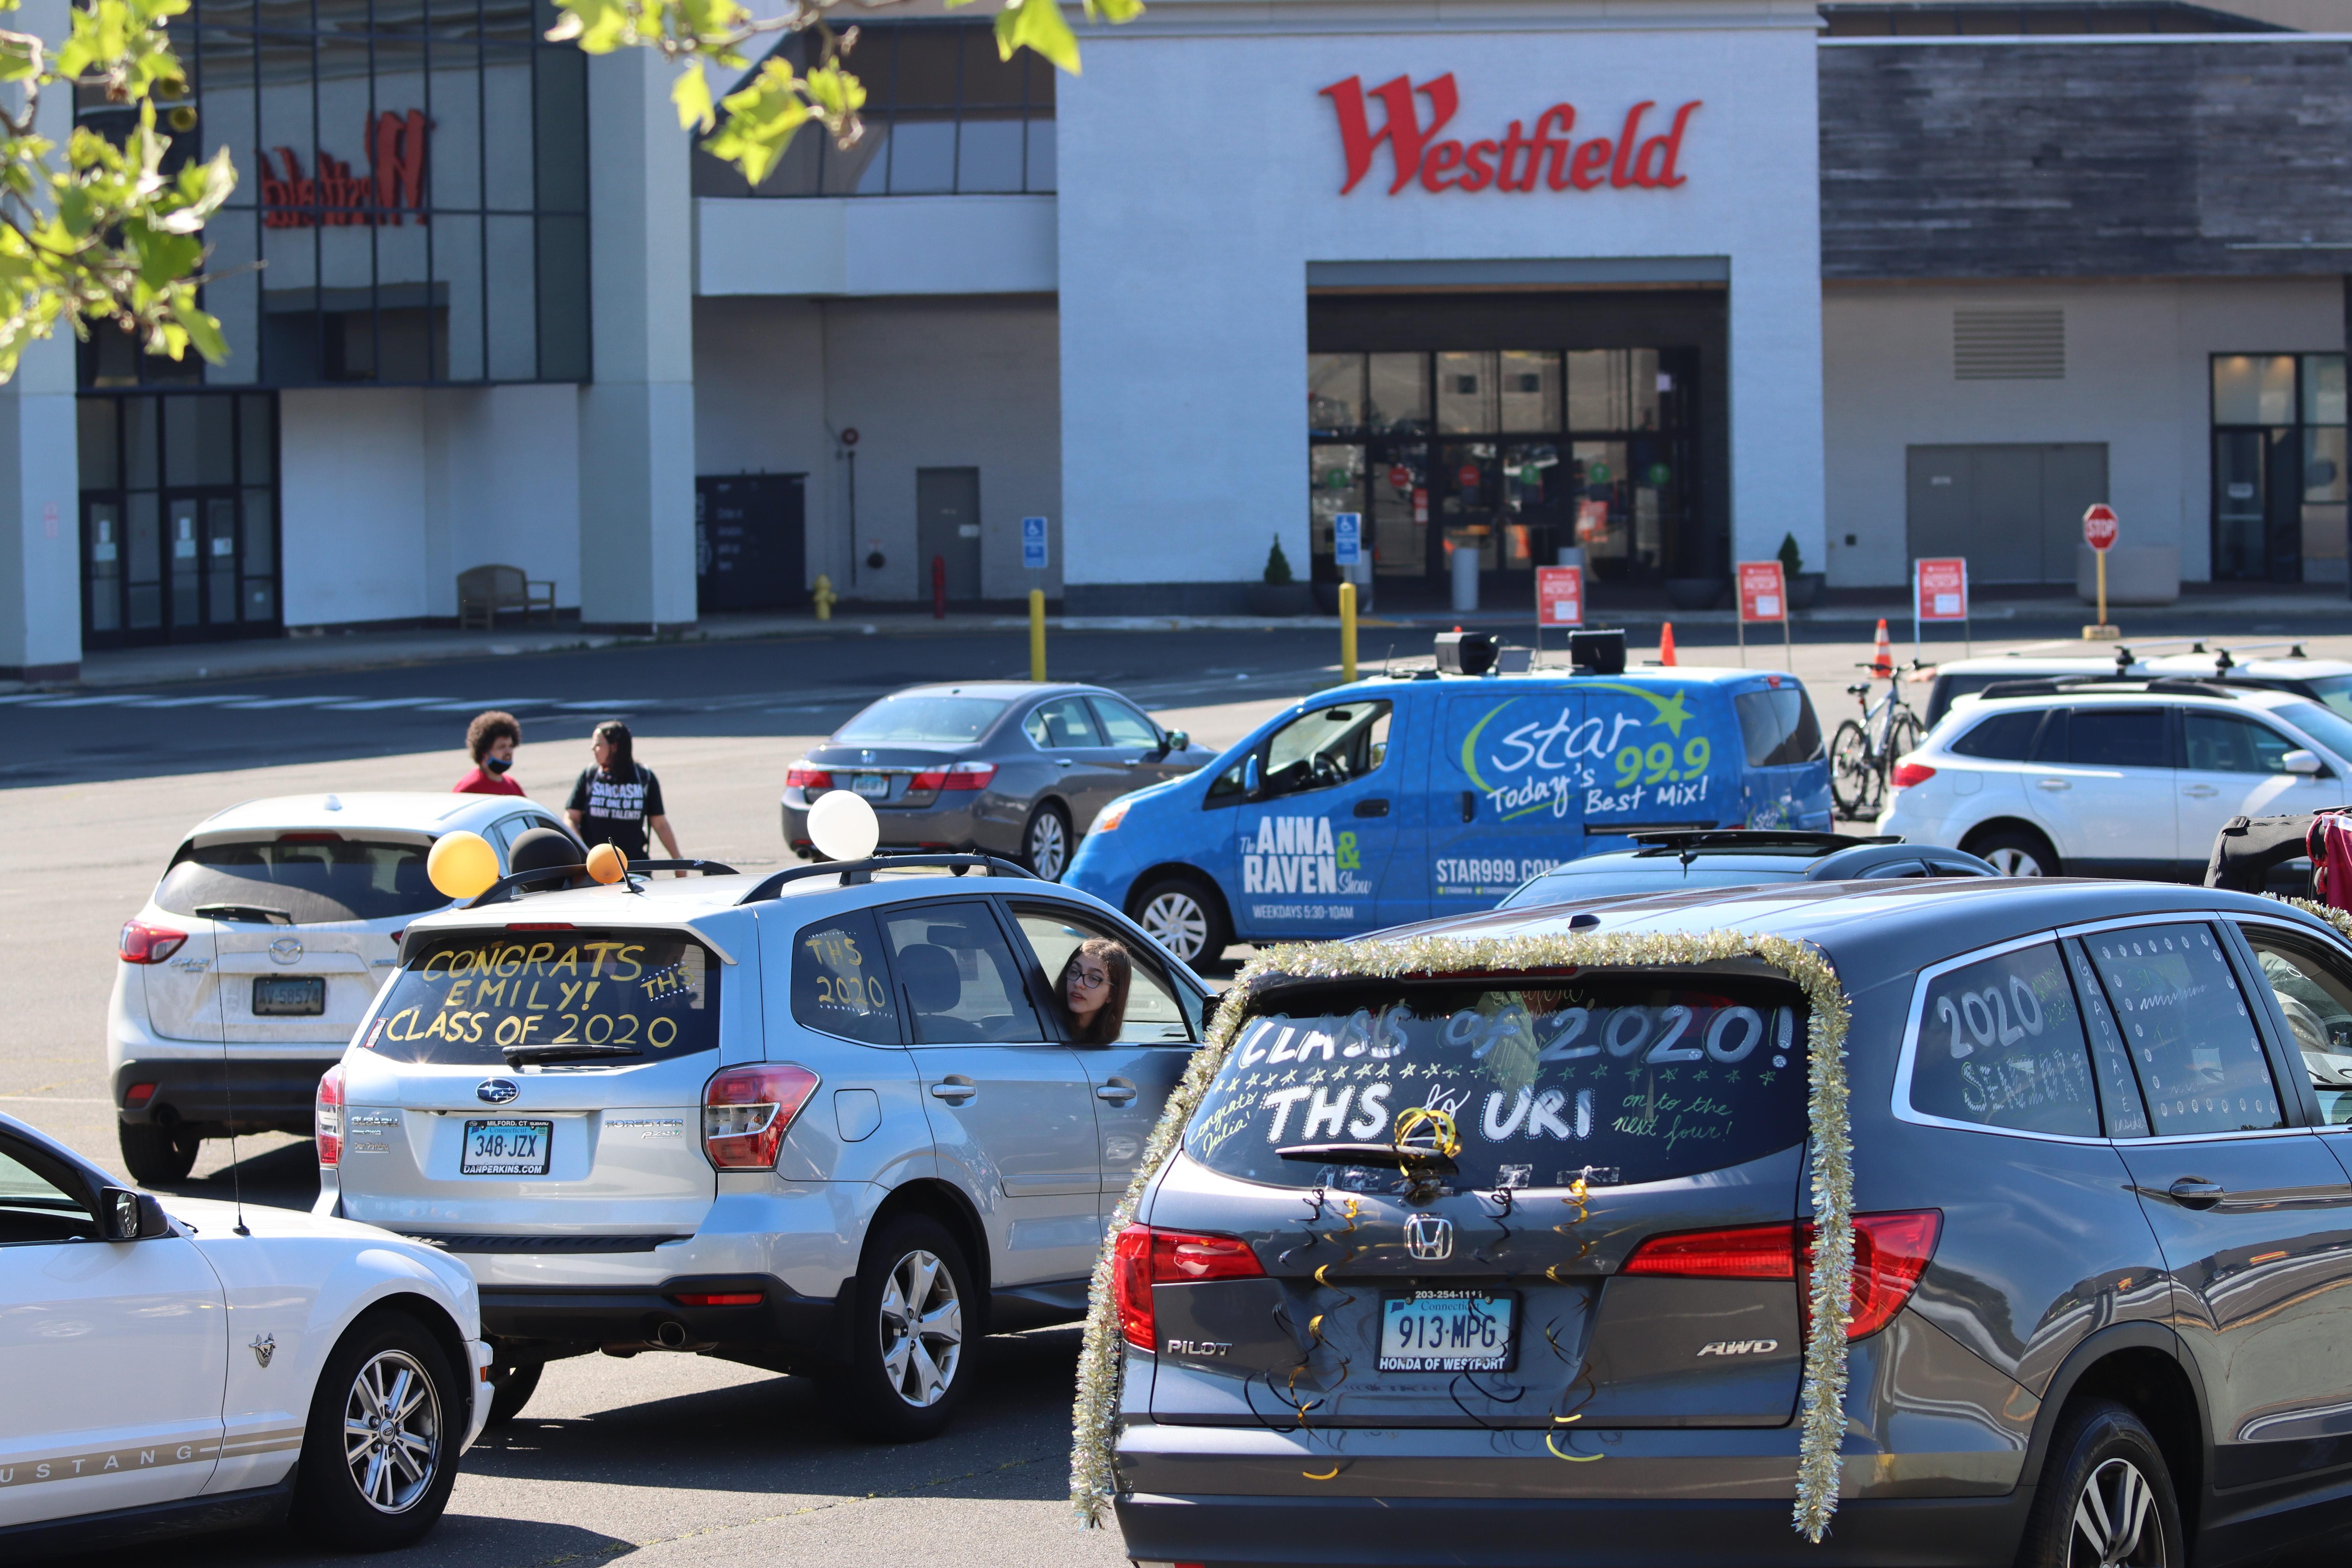 Trumbull High School Class of 2020 Car Parade